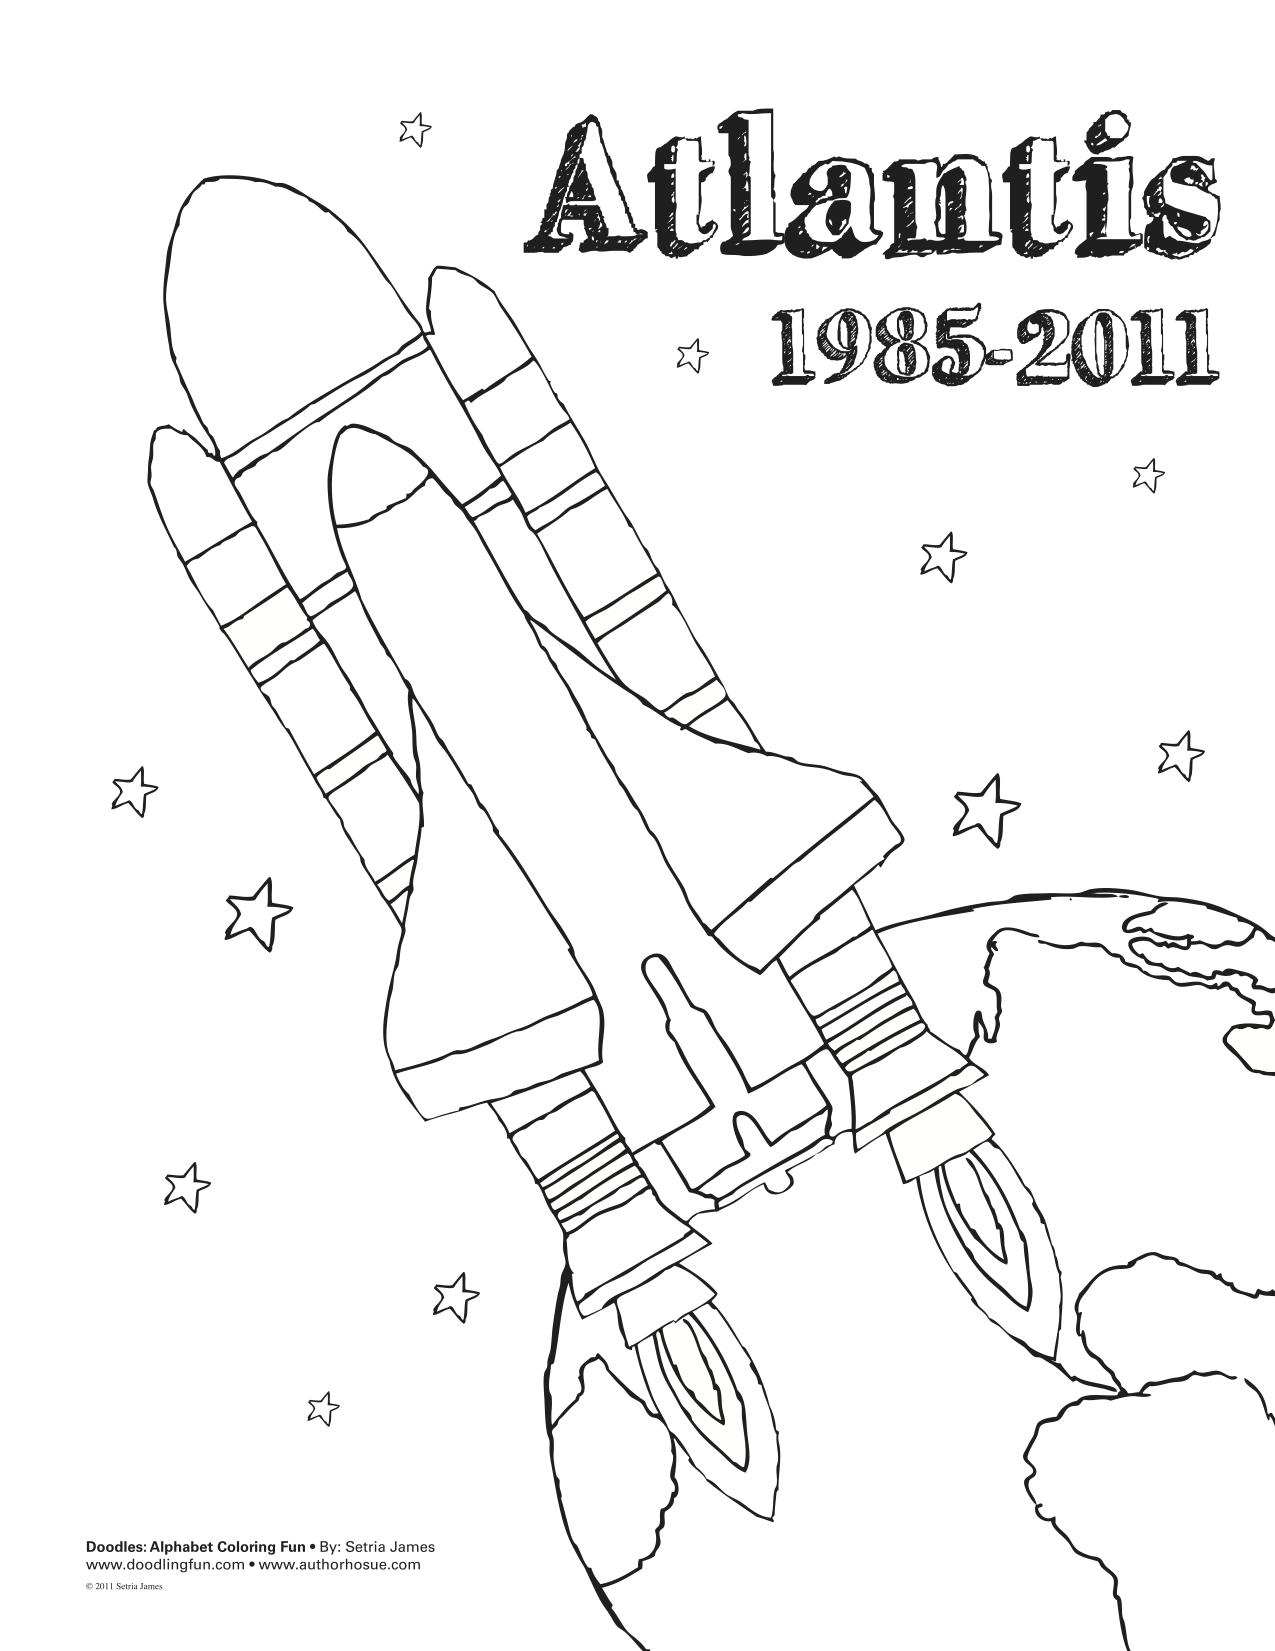 Atlantis Space Shuttle Coloring Sheet